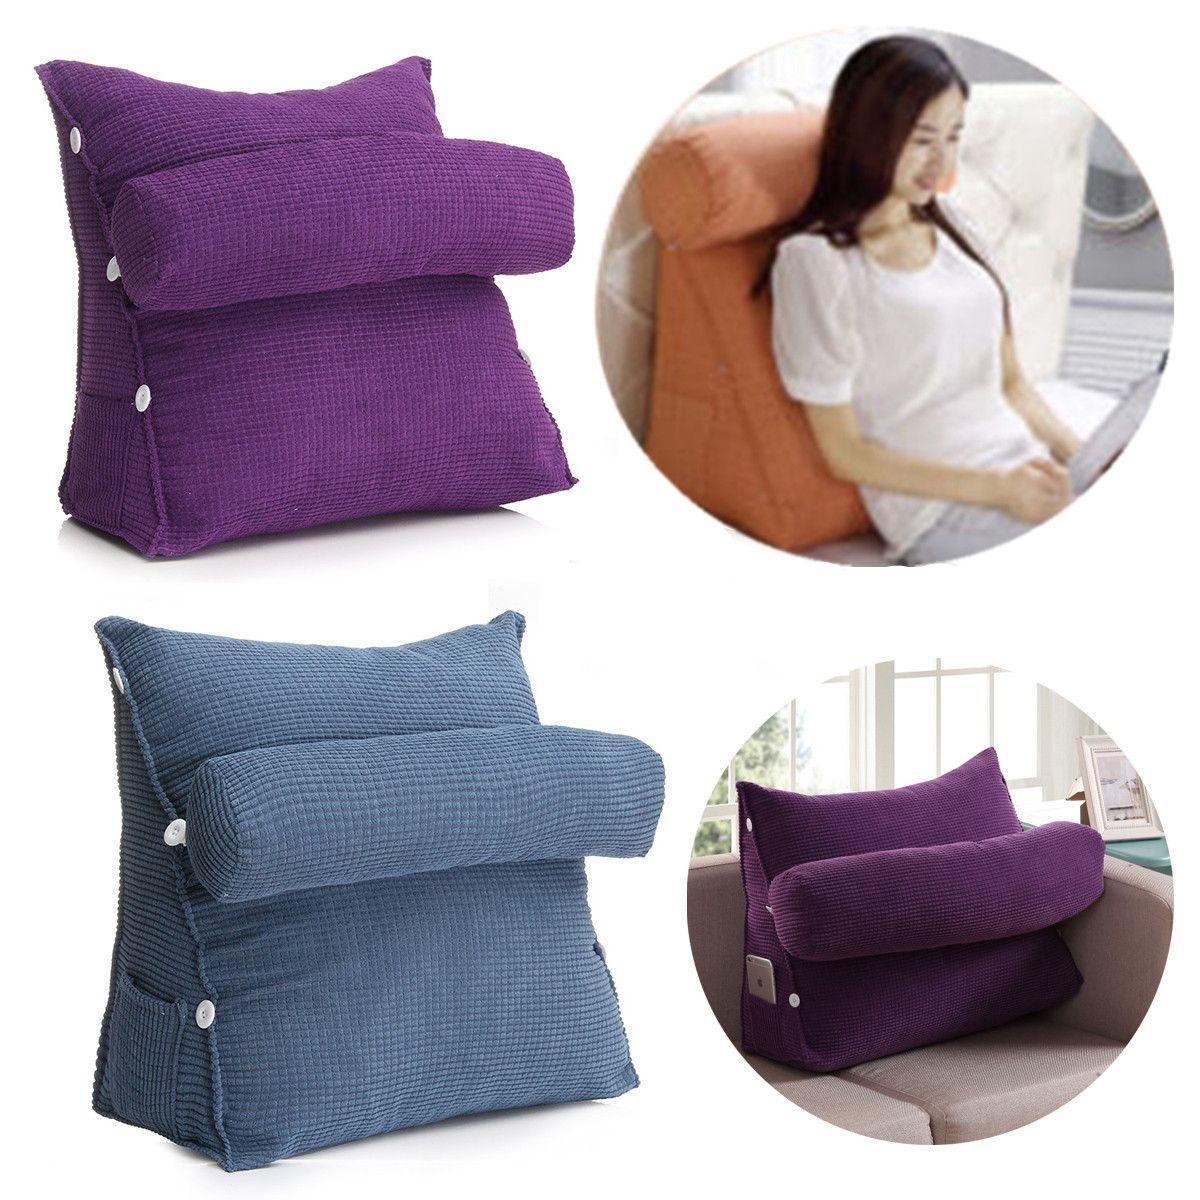 Home In 2020 Sofa Pillows Sofa Bed Office Wedge Cushion